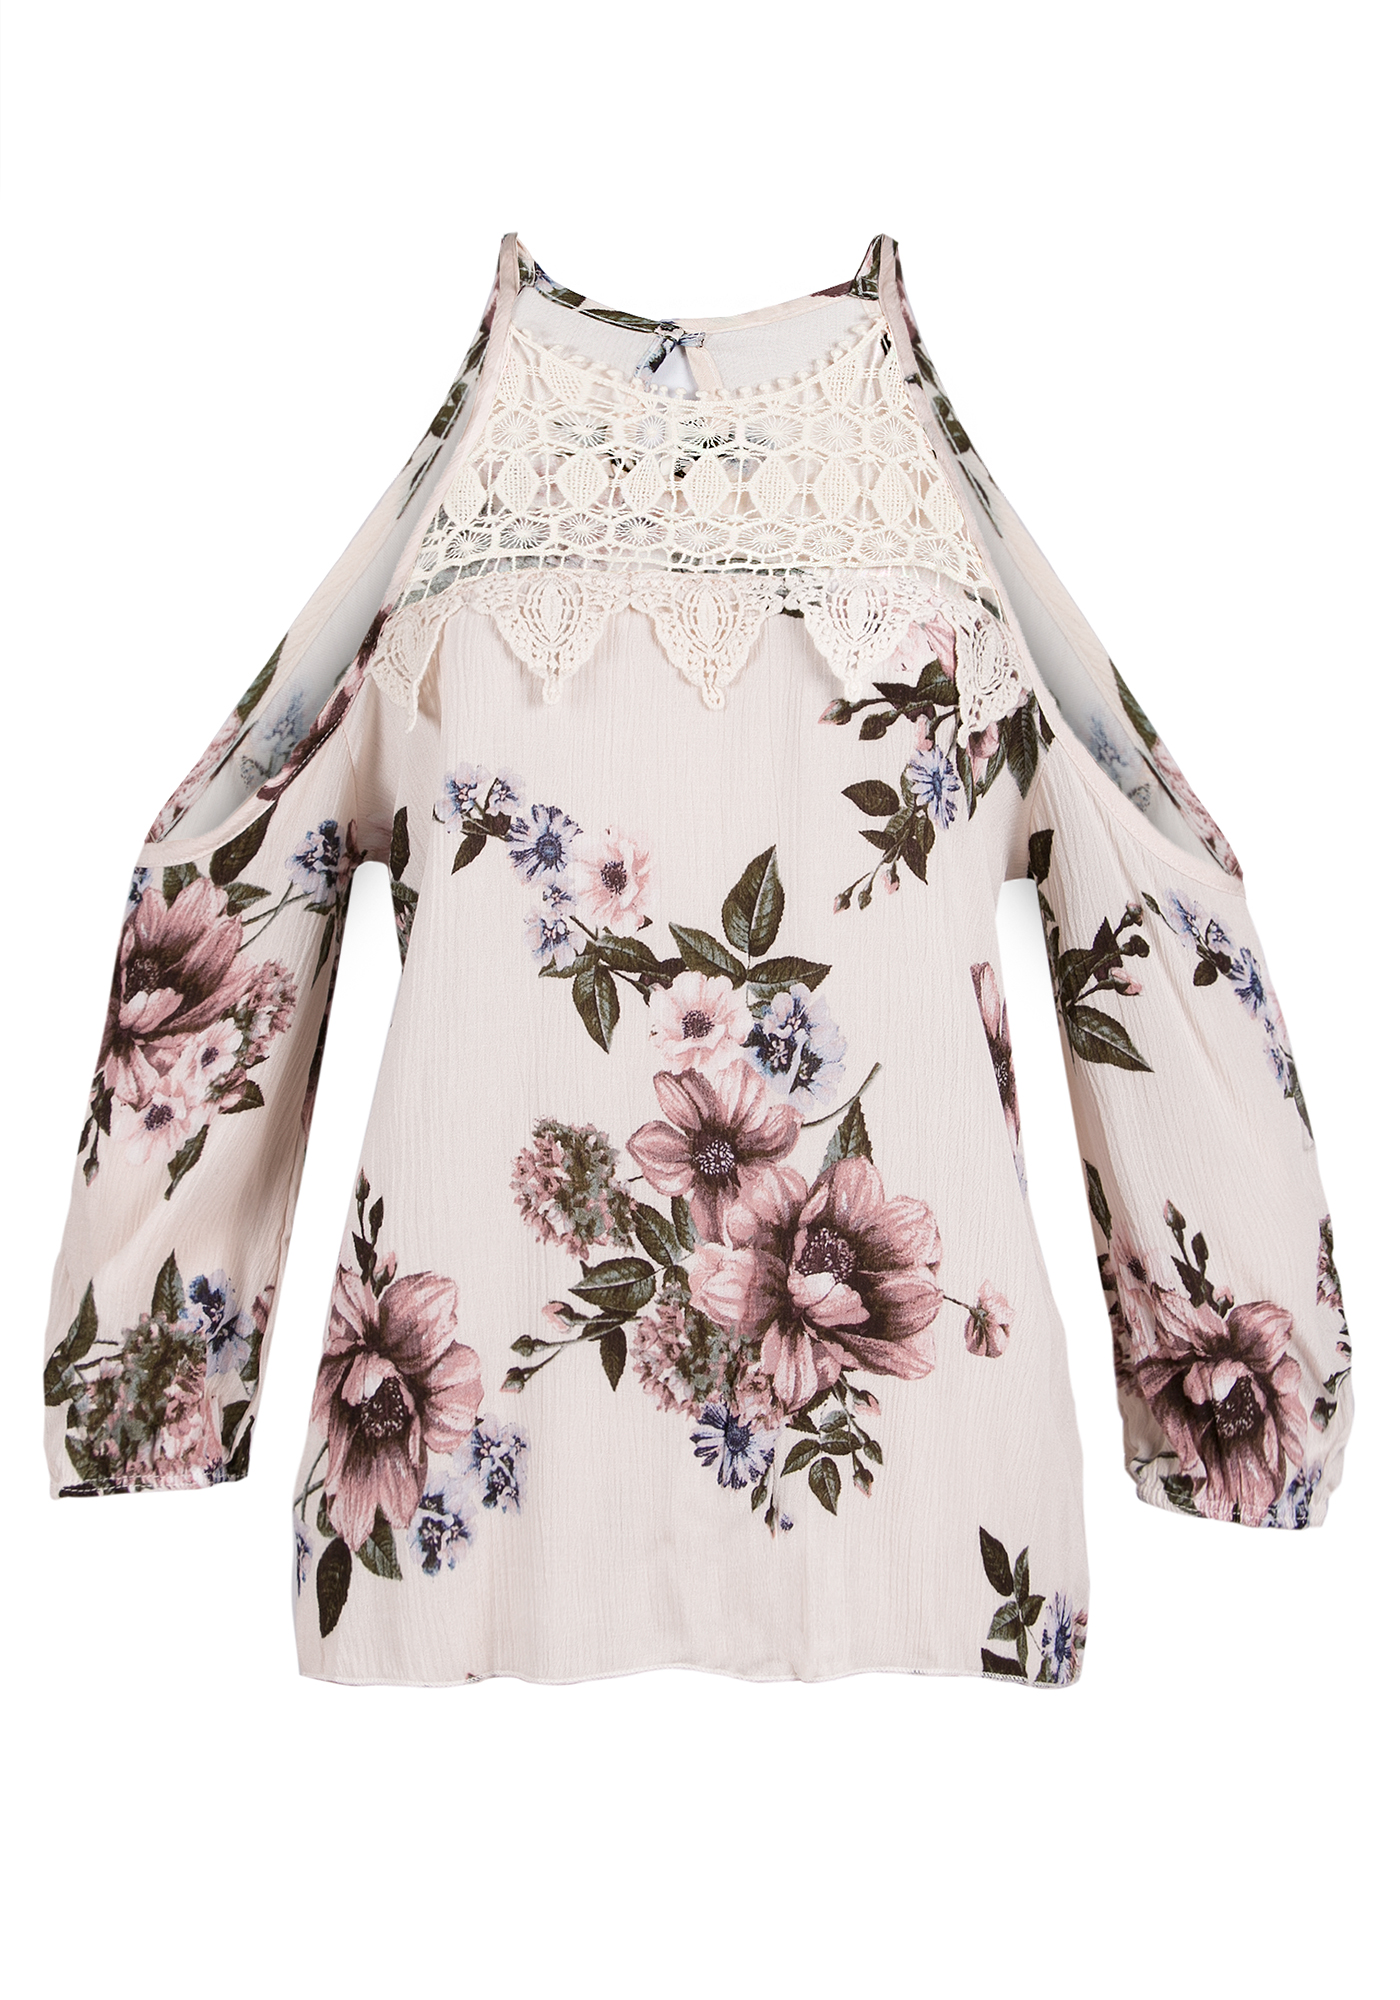 b84c00c253f65 Ladies  Floral Cold Shoulder Top